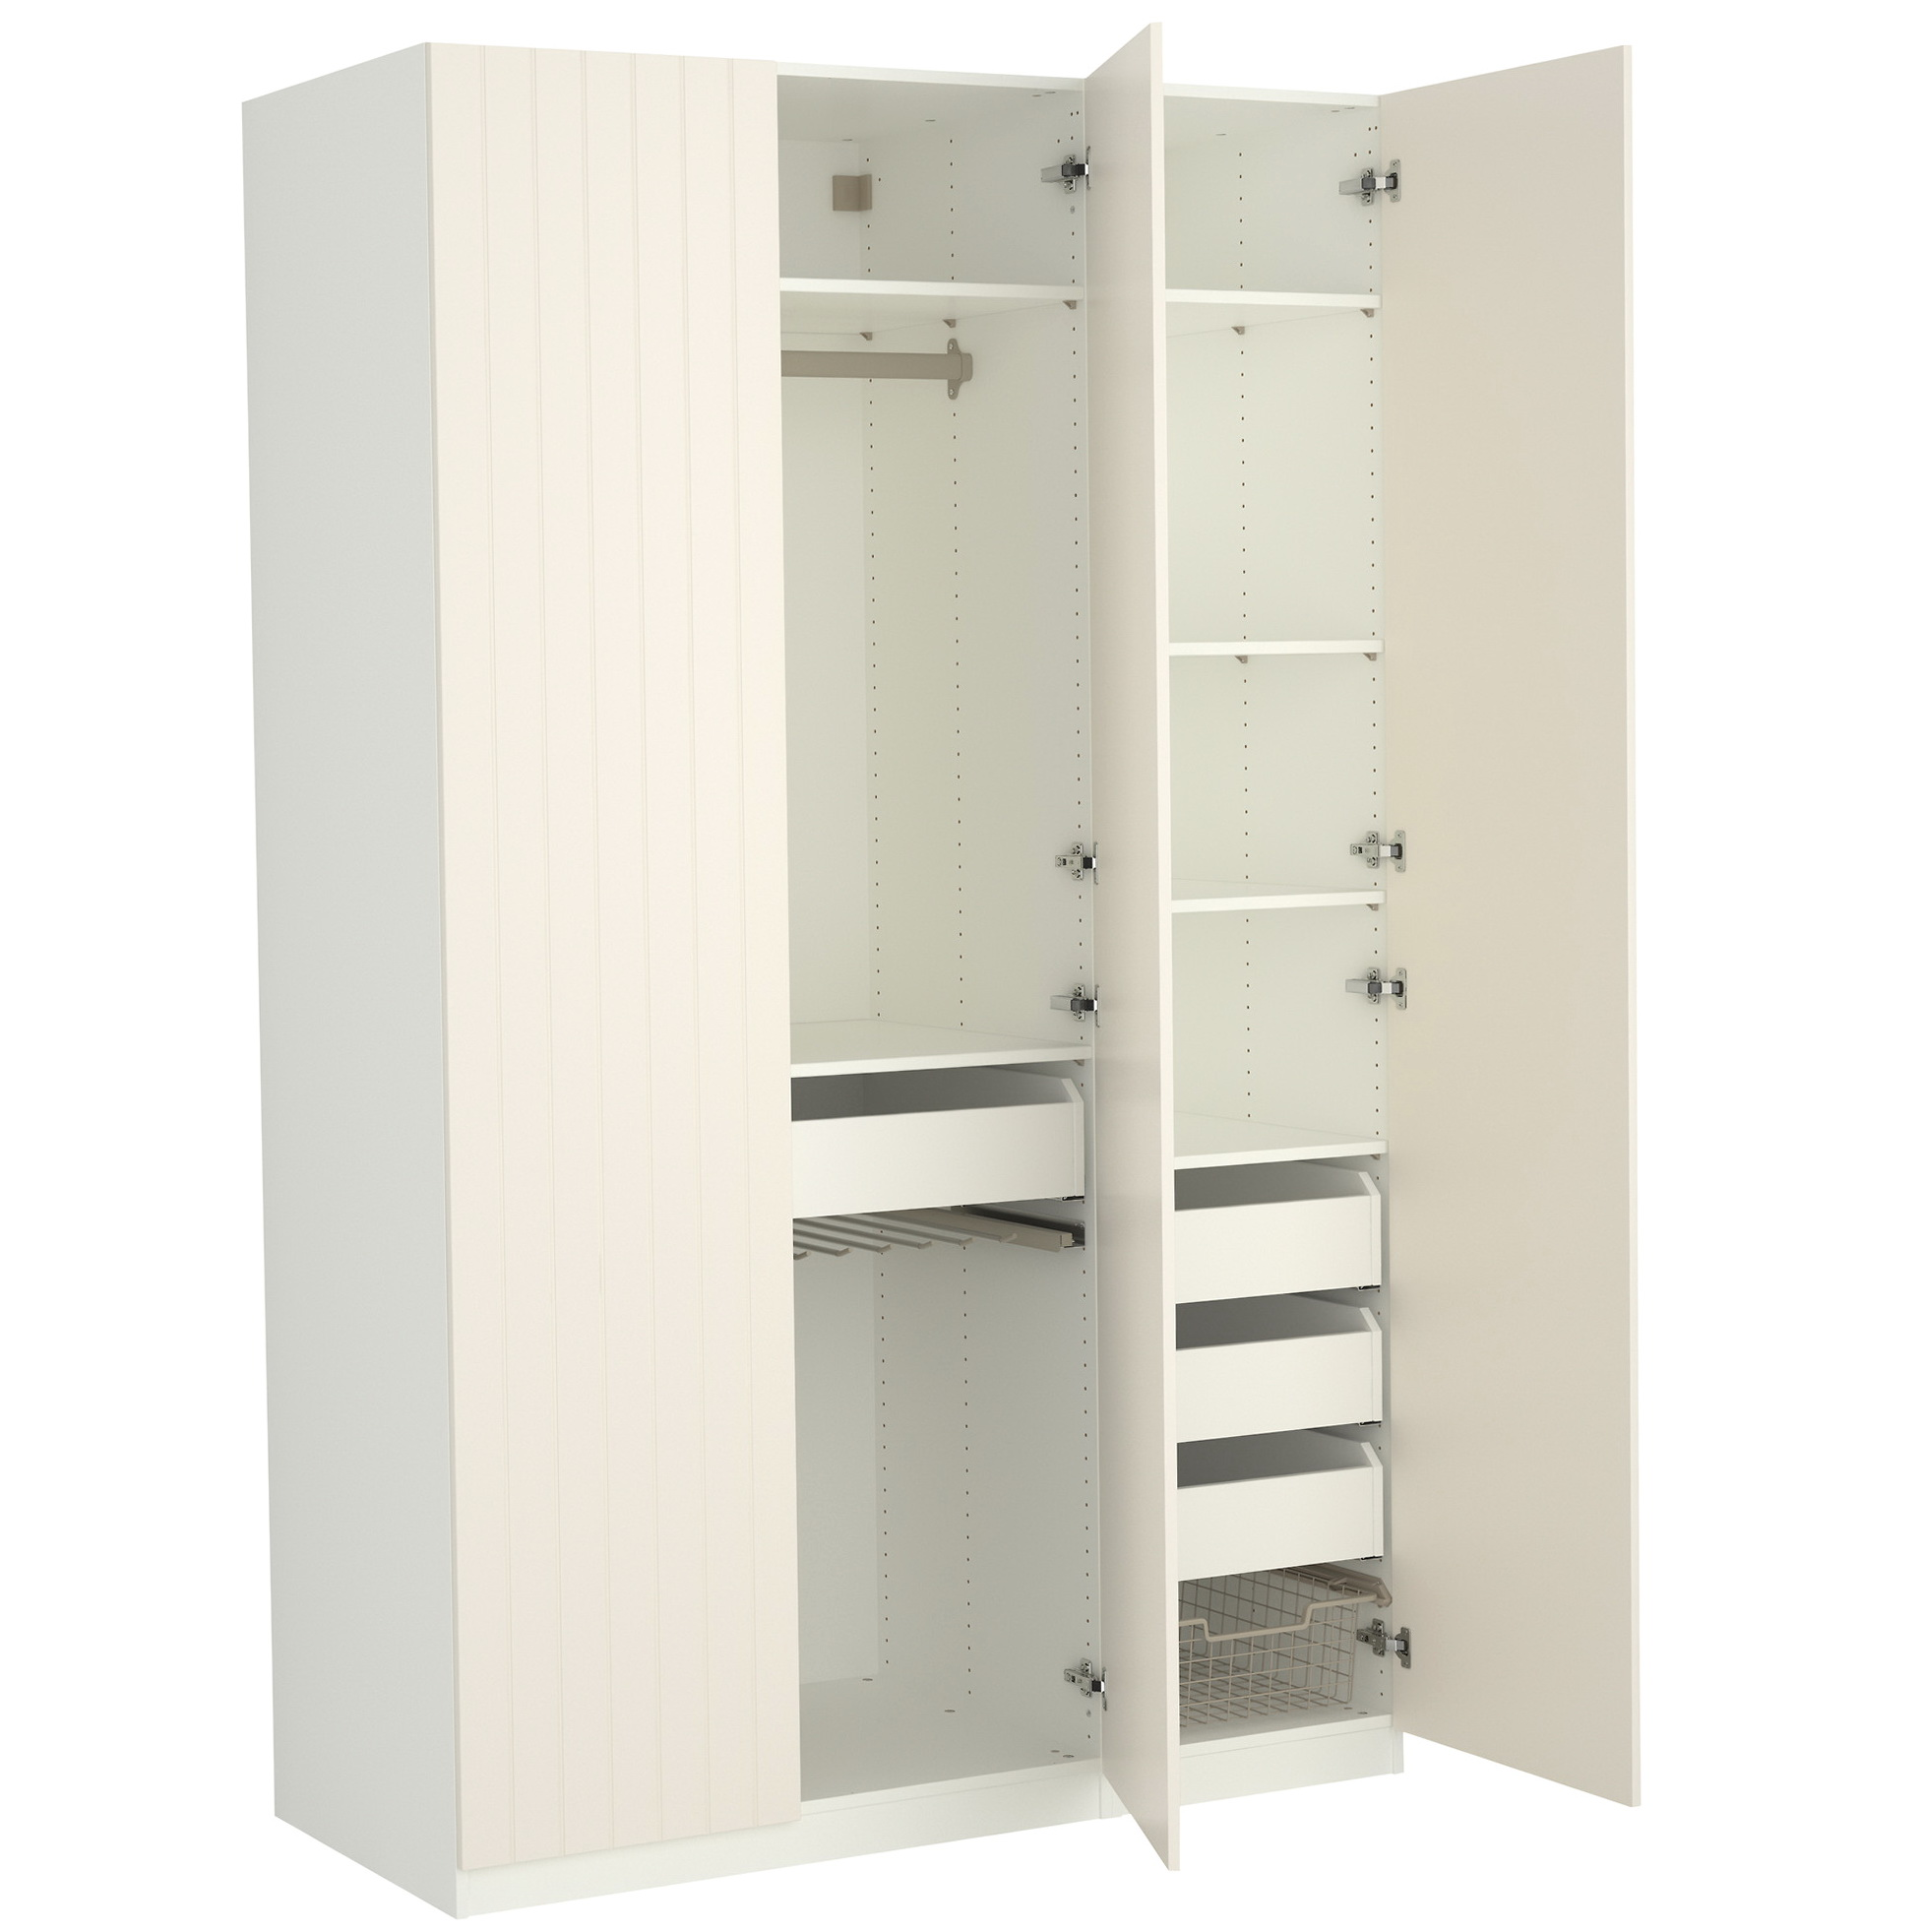 Free Standing Closet Systems Ikea Home Design Ideas